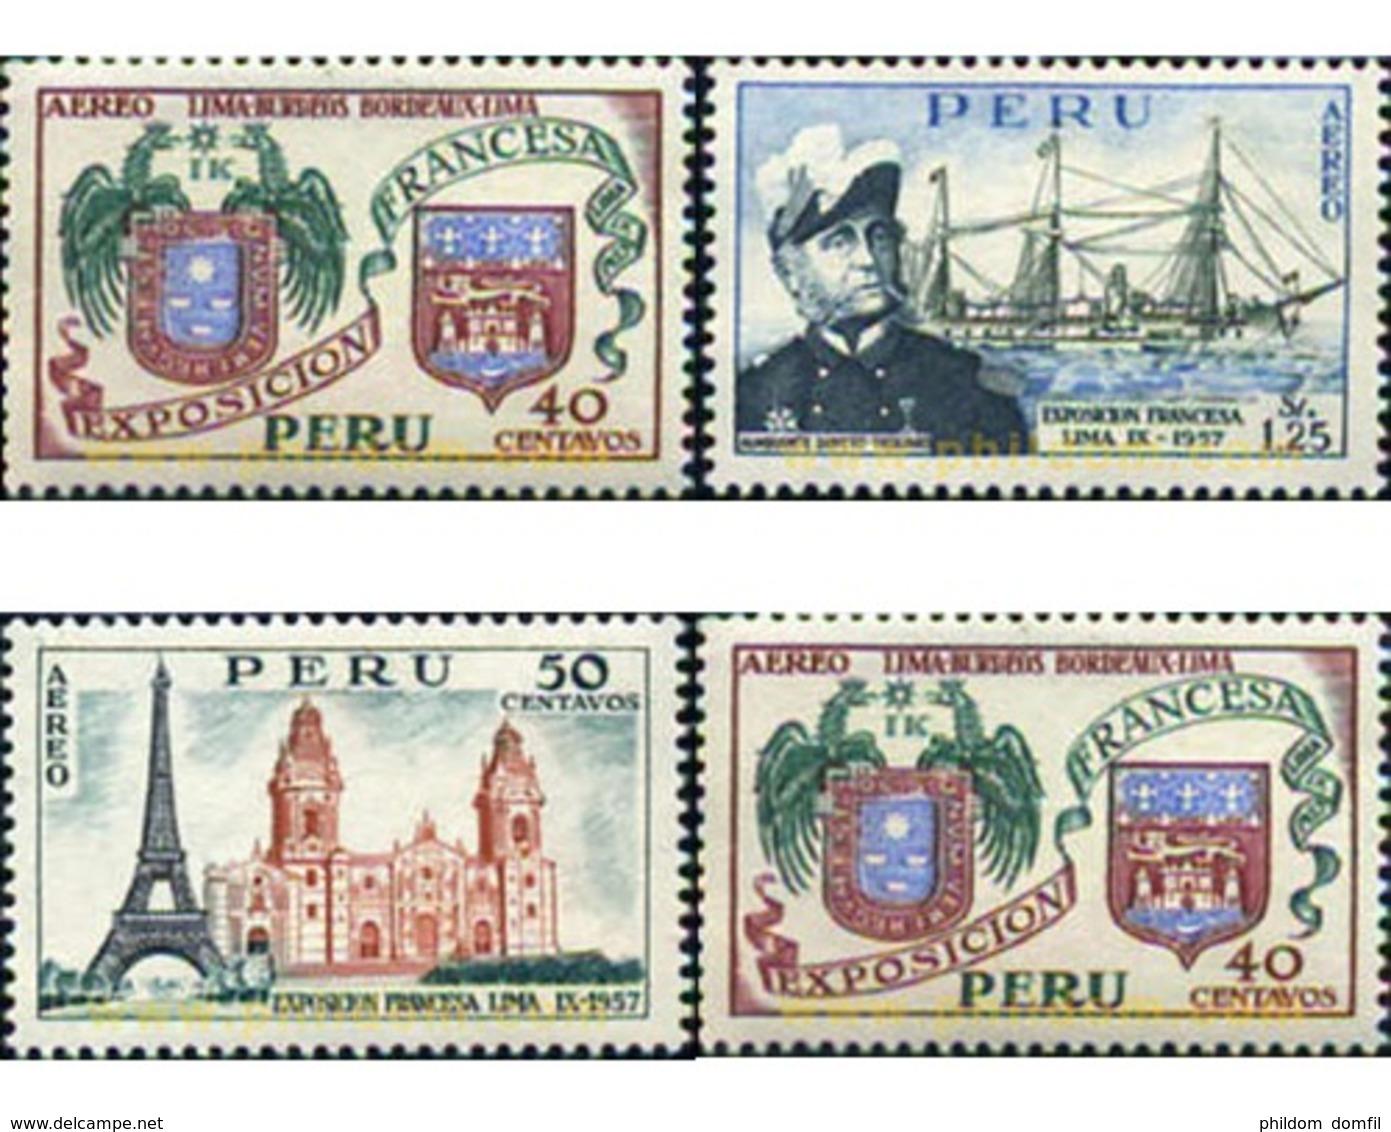 Ref. 352161 * MNH * - PERU. 1957. EXPOSICION FRANCESA EN LIMA - Perù